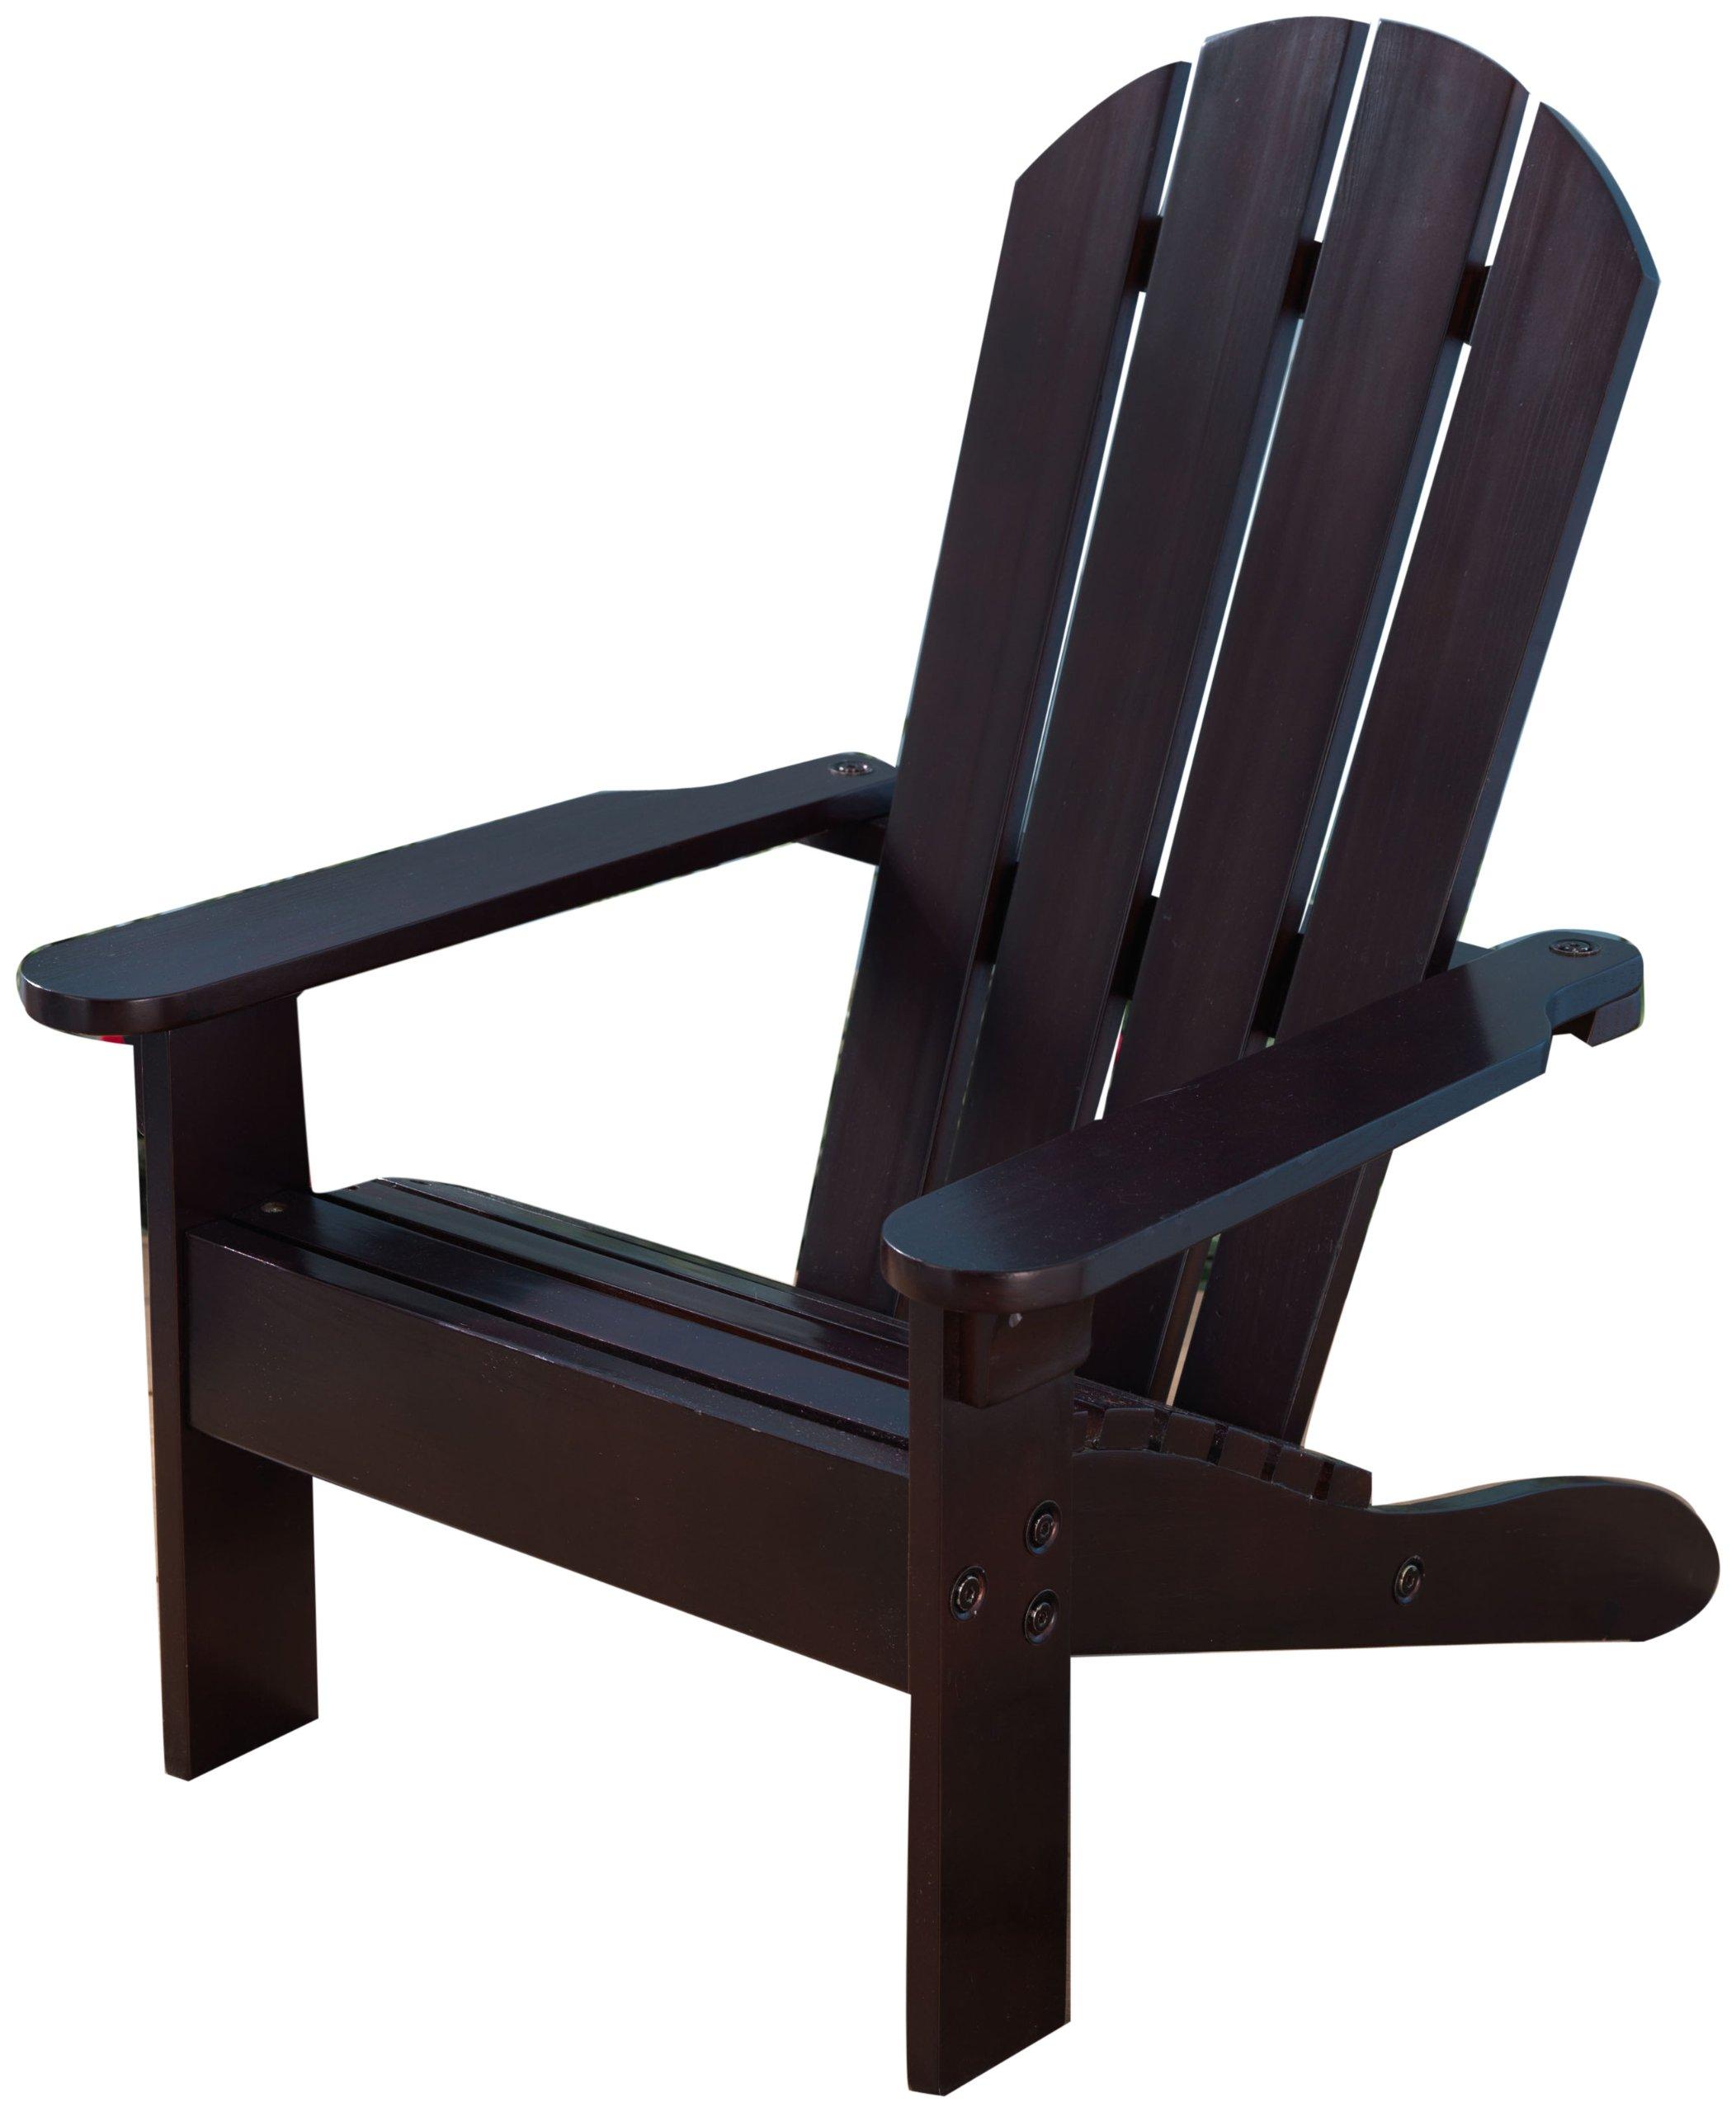 KidKraft Wooden Adirondack Children's Outdoor Chair, Weather-Resistant - Espresso